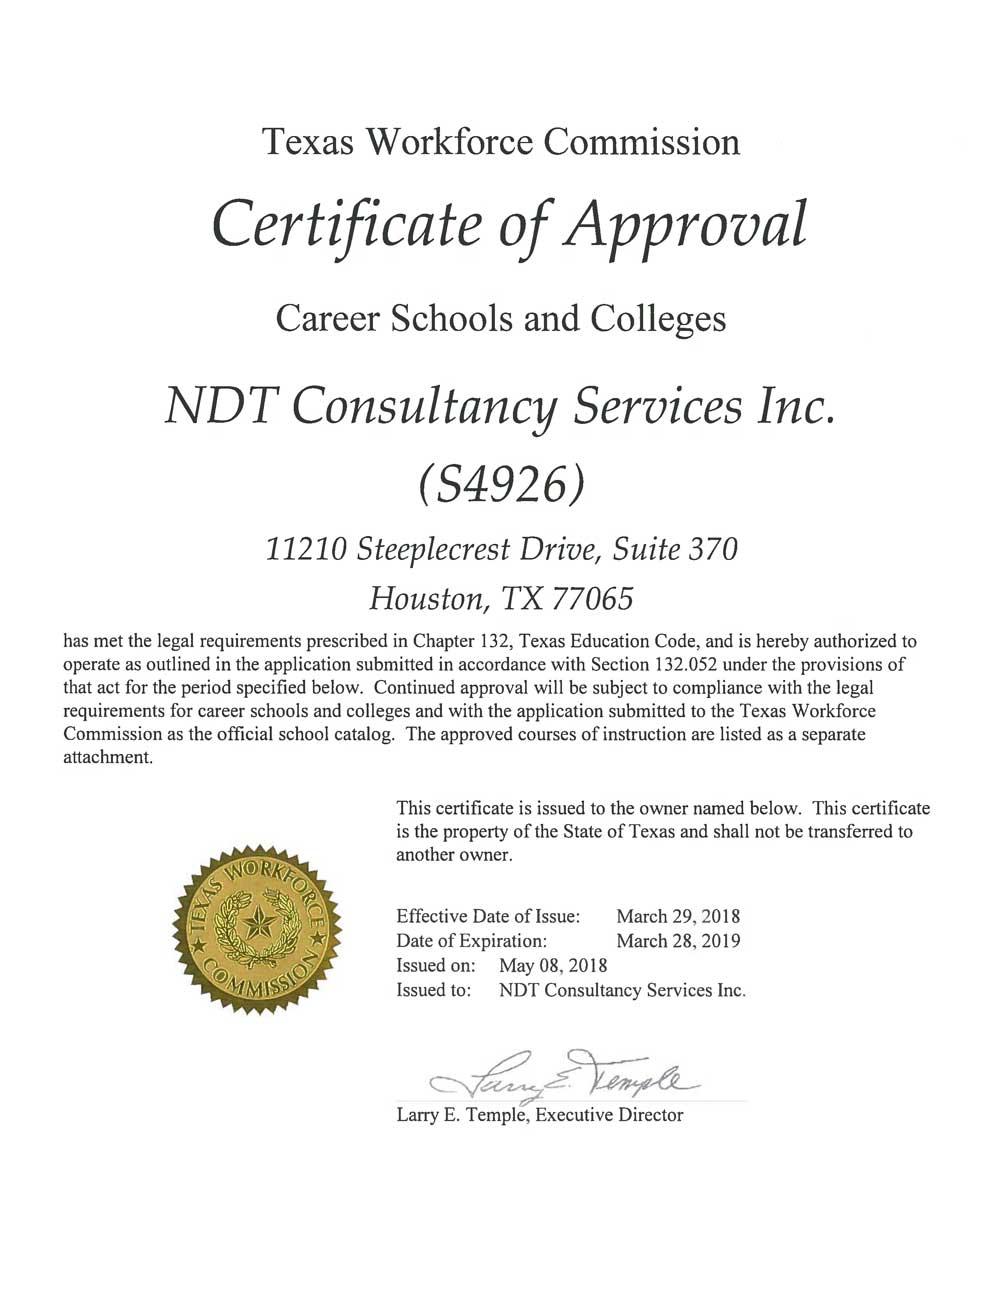 TWC Certificate 2018-2019